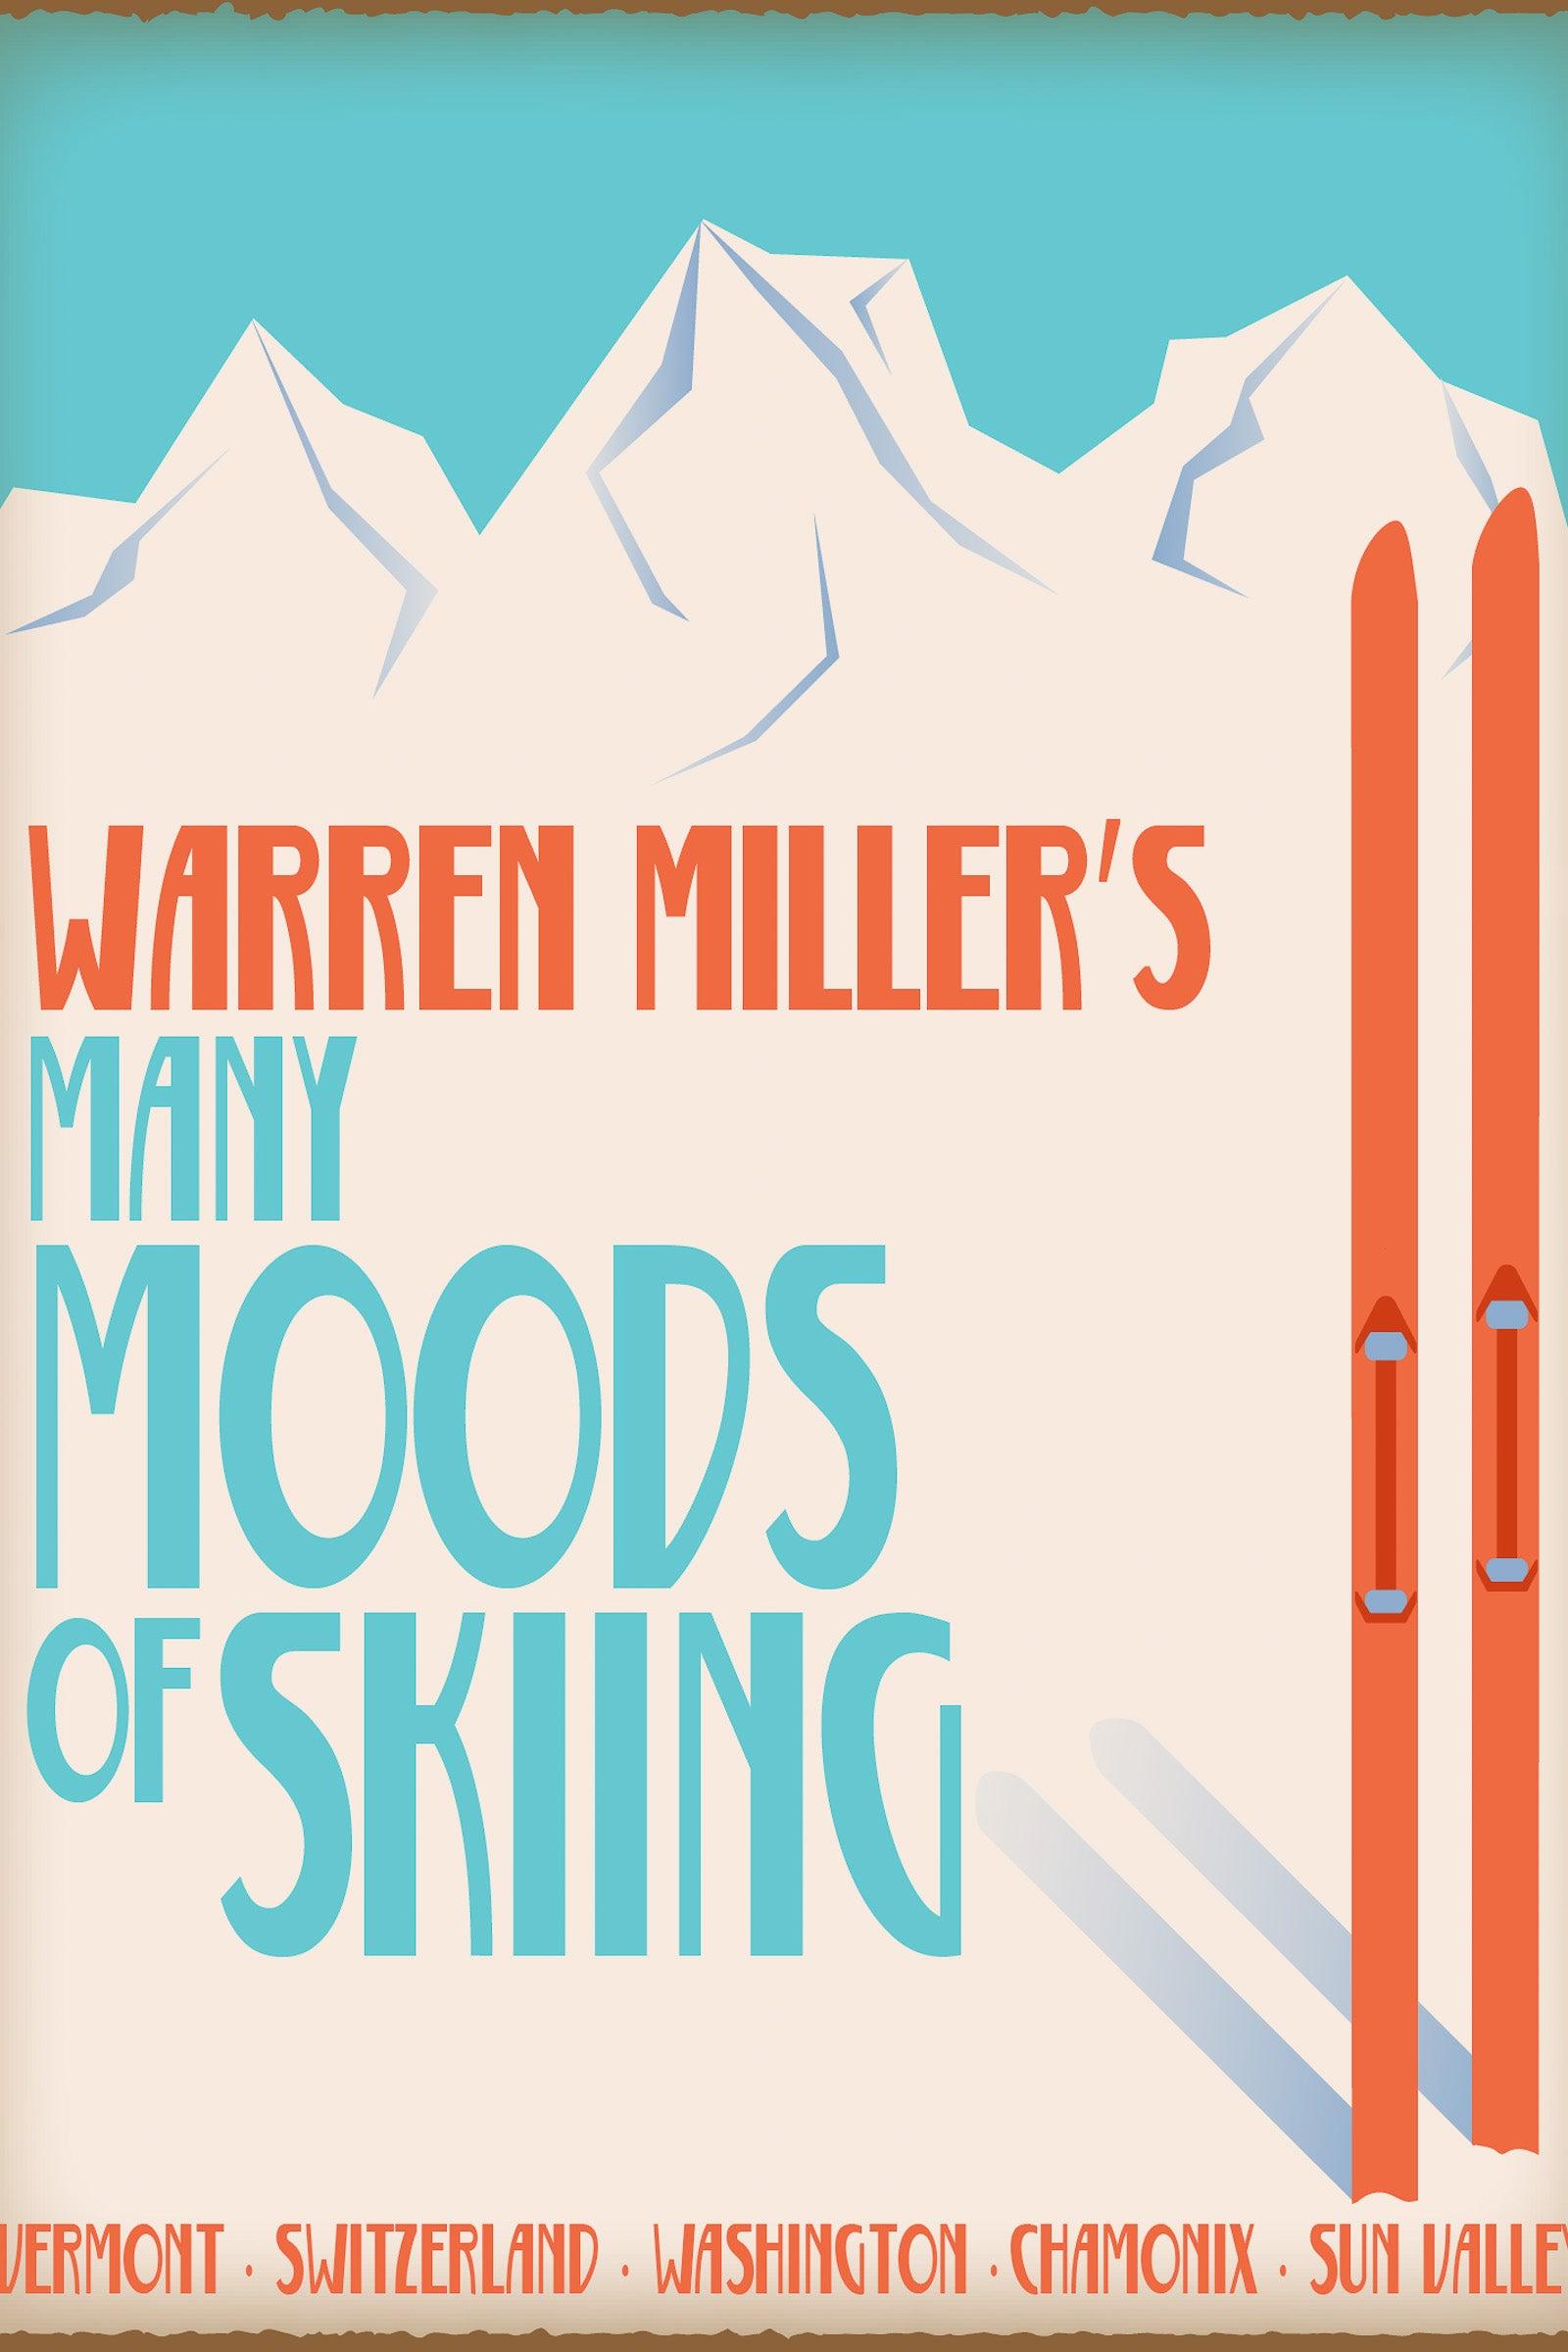 Many Moods of Skiing (1961)